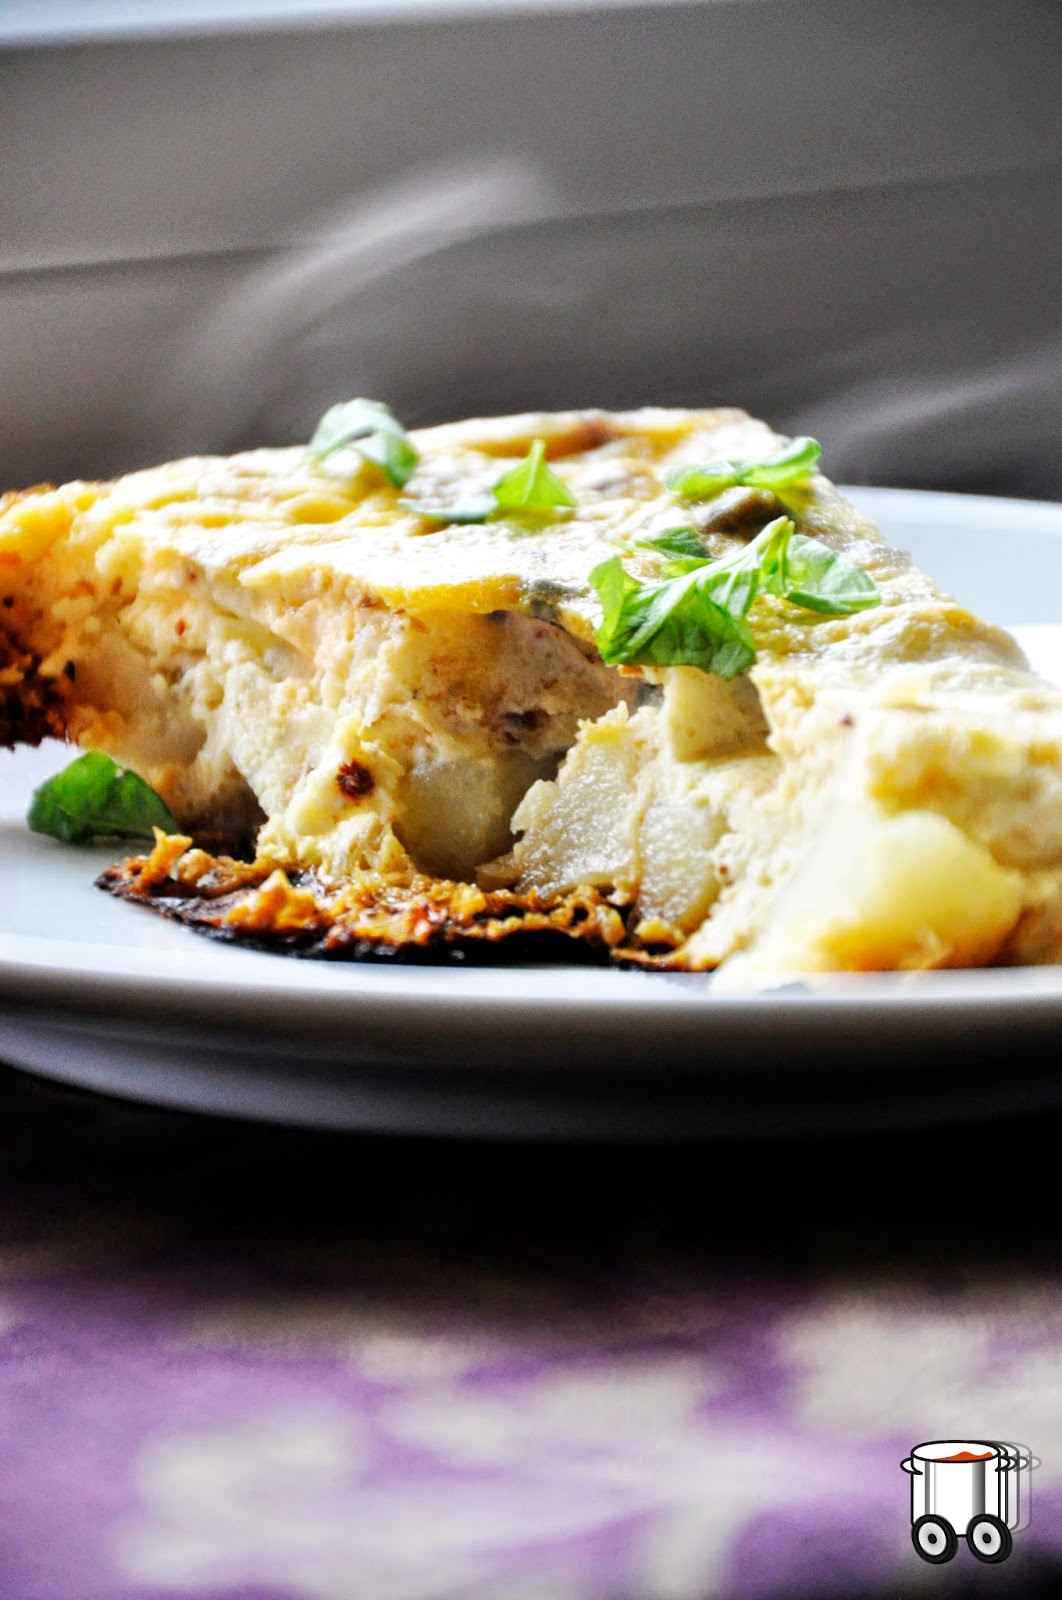 Szybko Tanio Smacznie - Tortilla de patatas